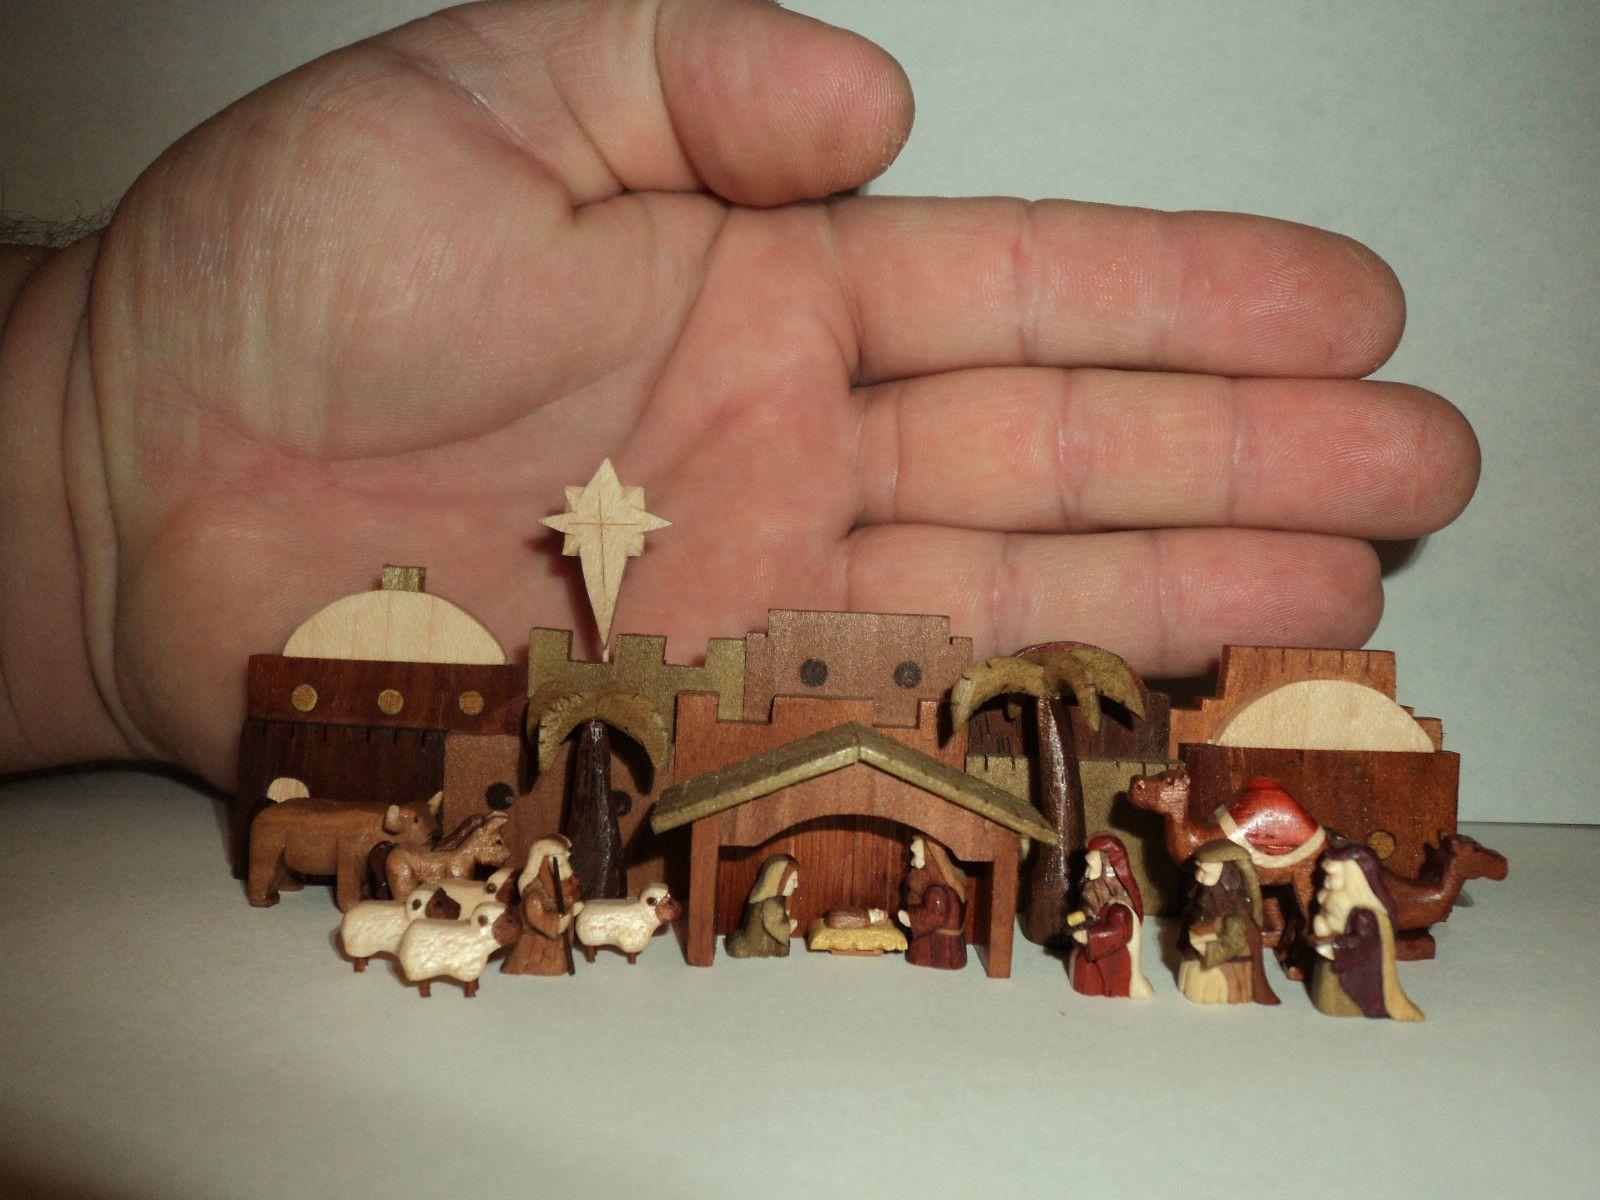 Artist Miniature Nativity Set Hand Carved Wooden Micro Original